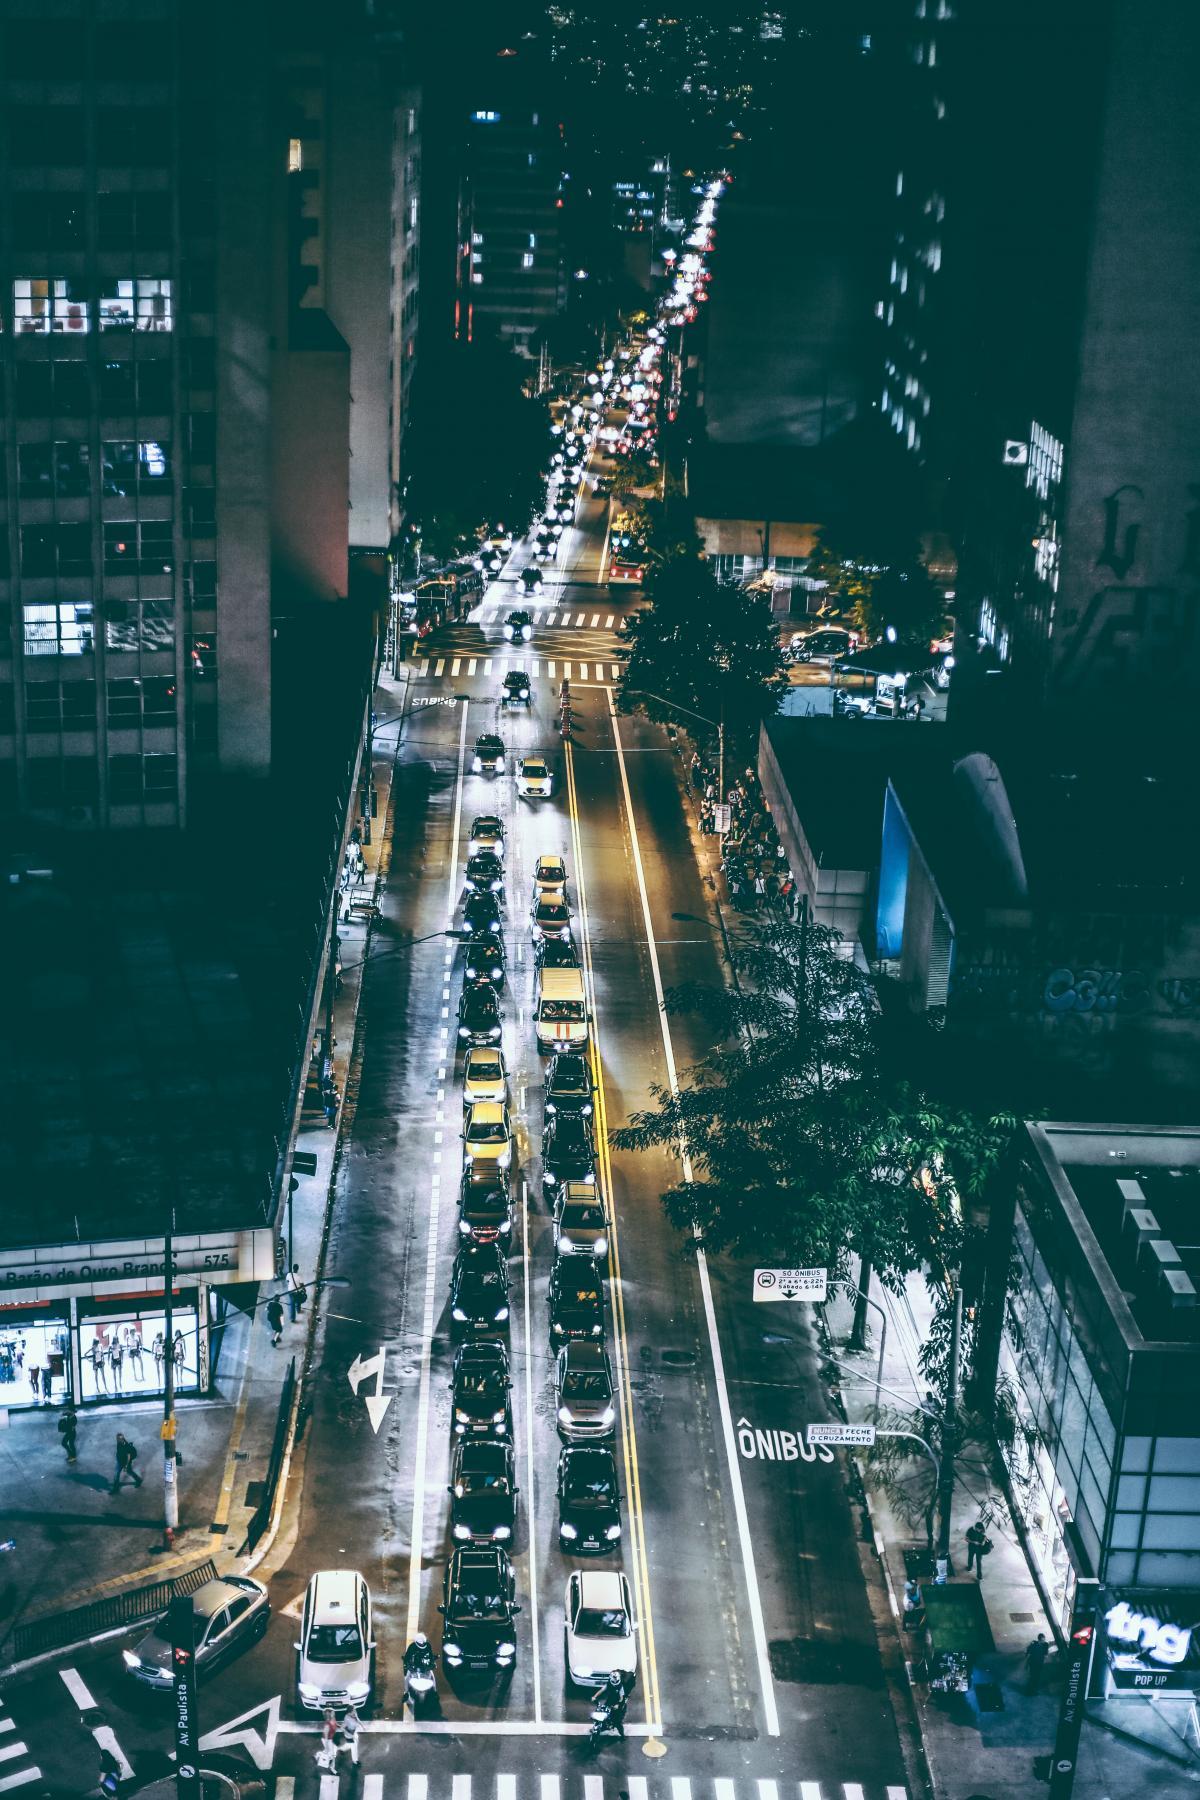 Cars on Black Asphalt Road during Nighttime #44427